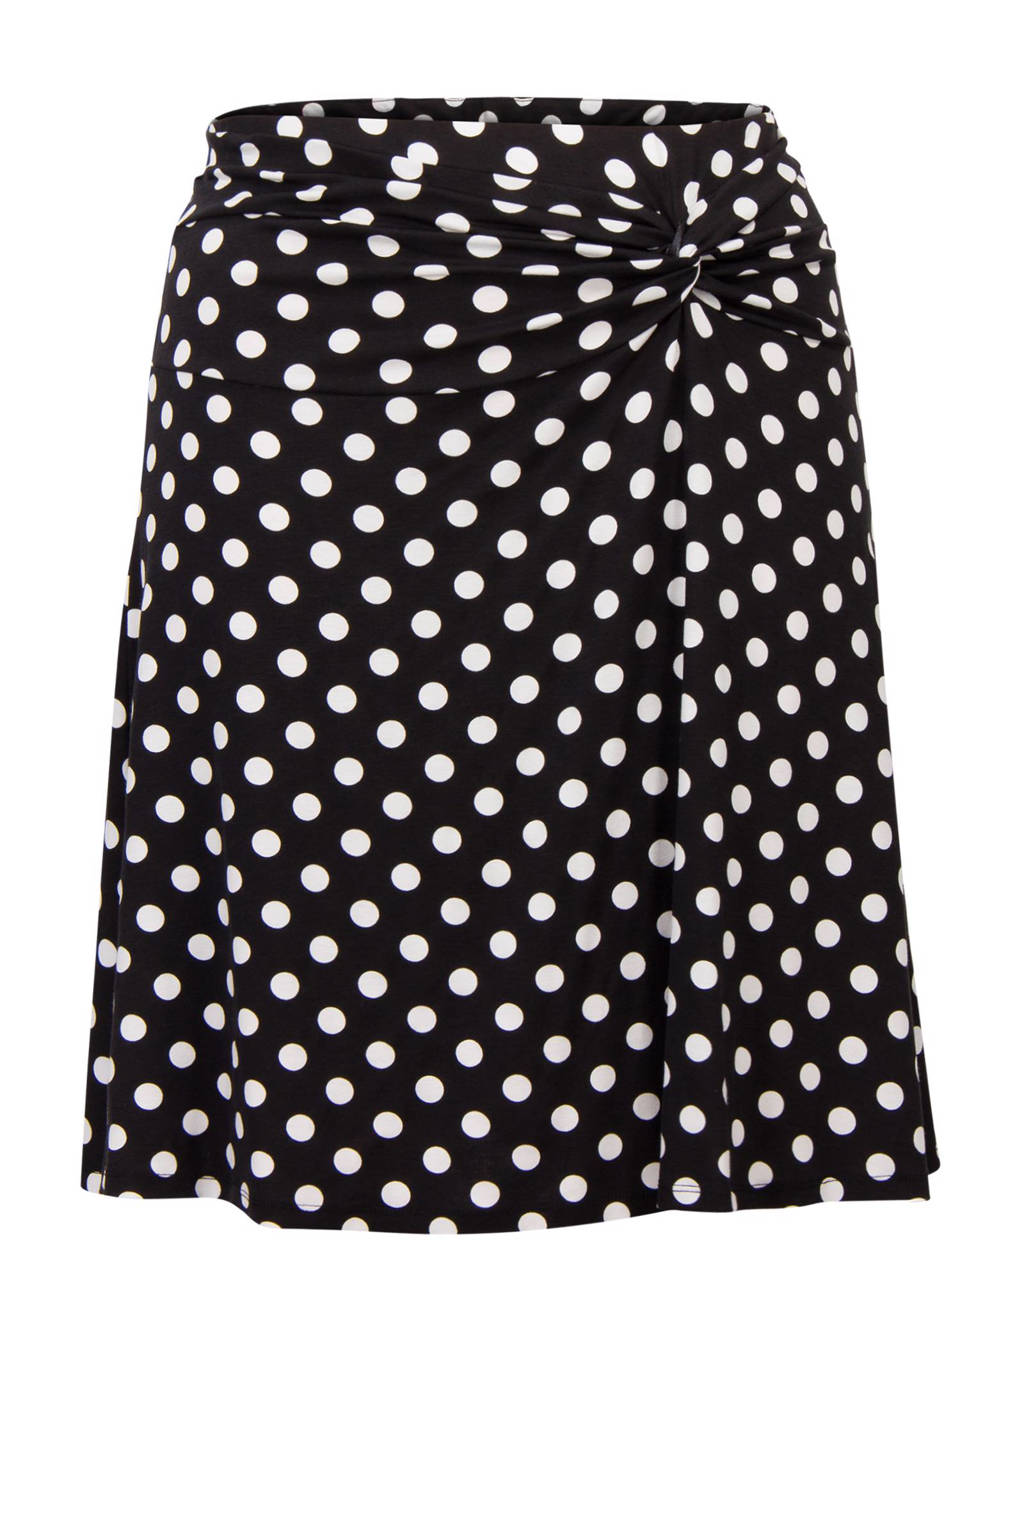 Miss Etam Plus A-lijn rok, Zwart/wit